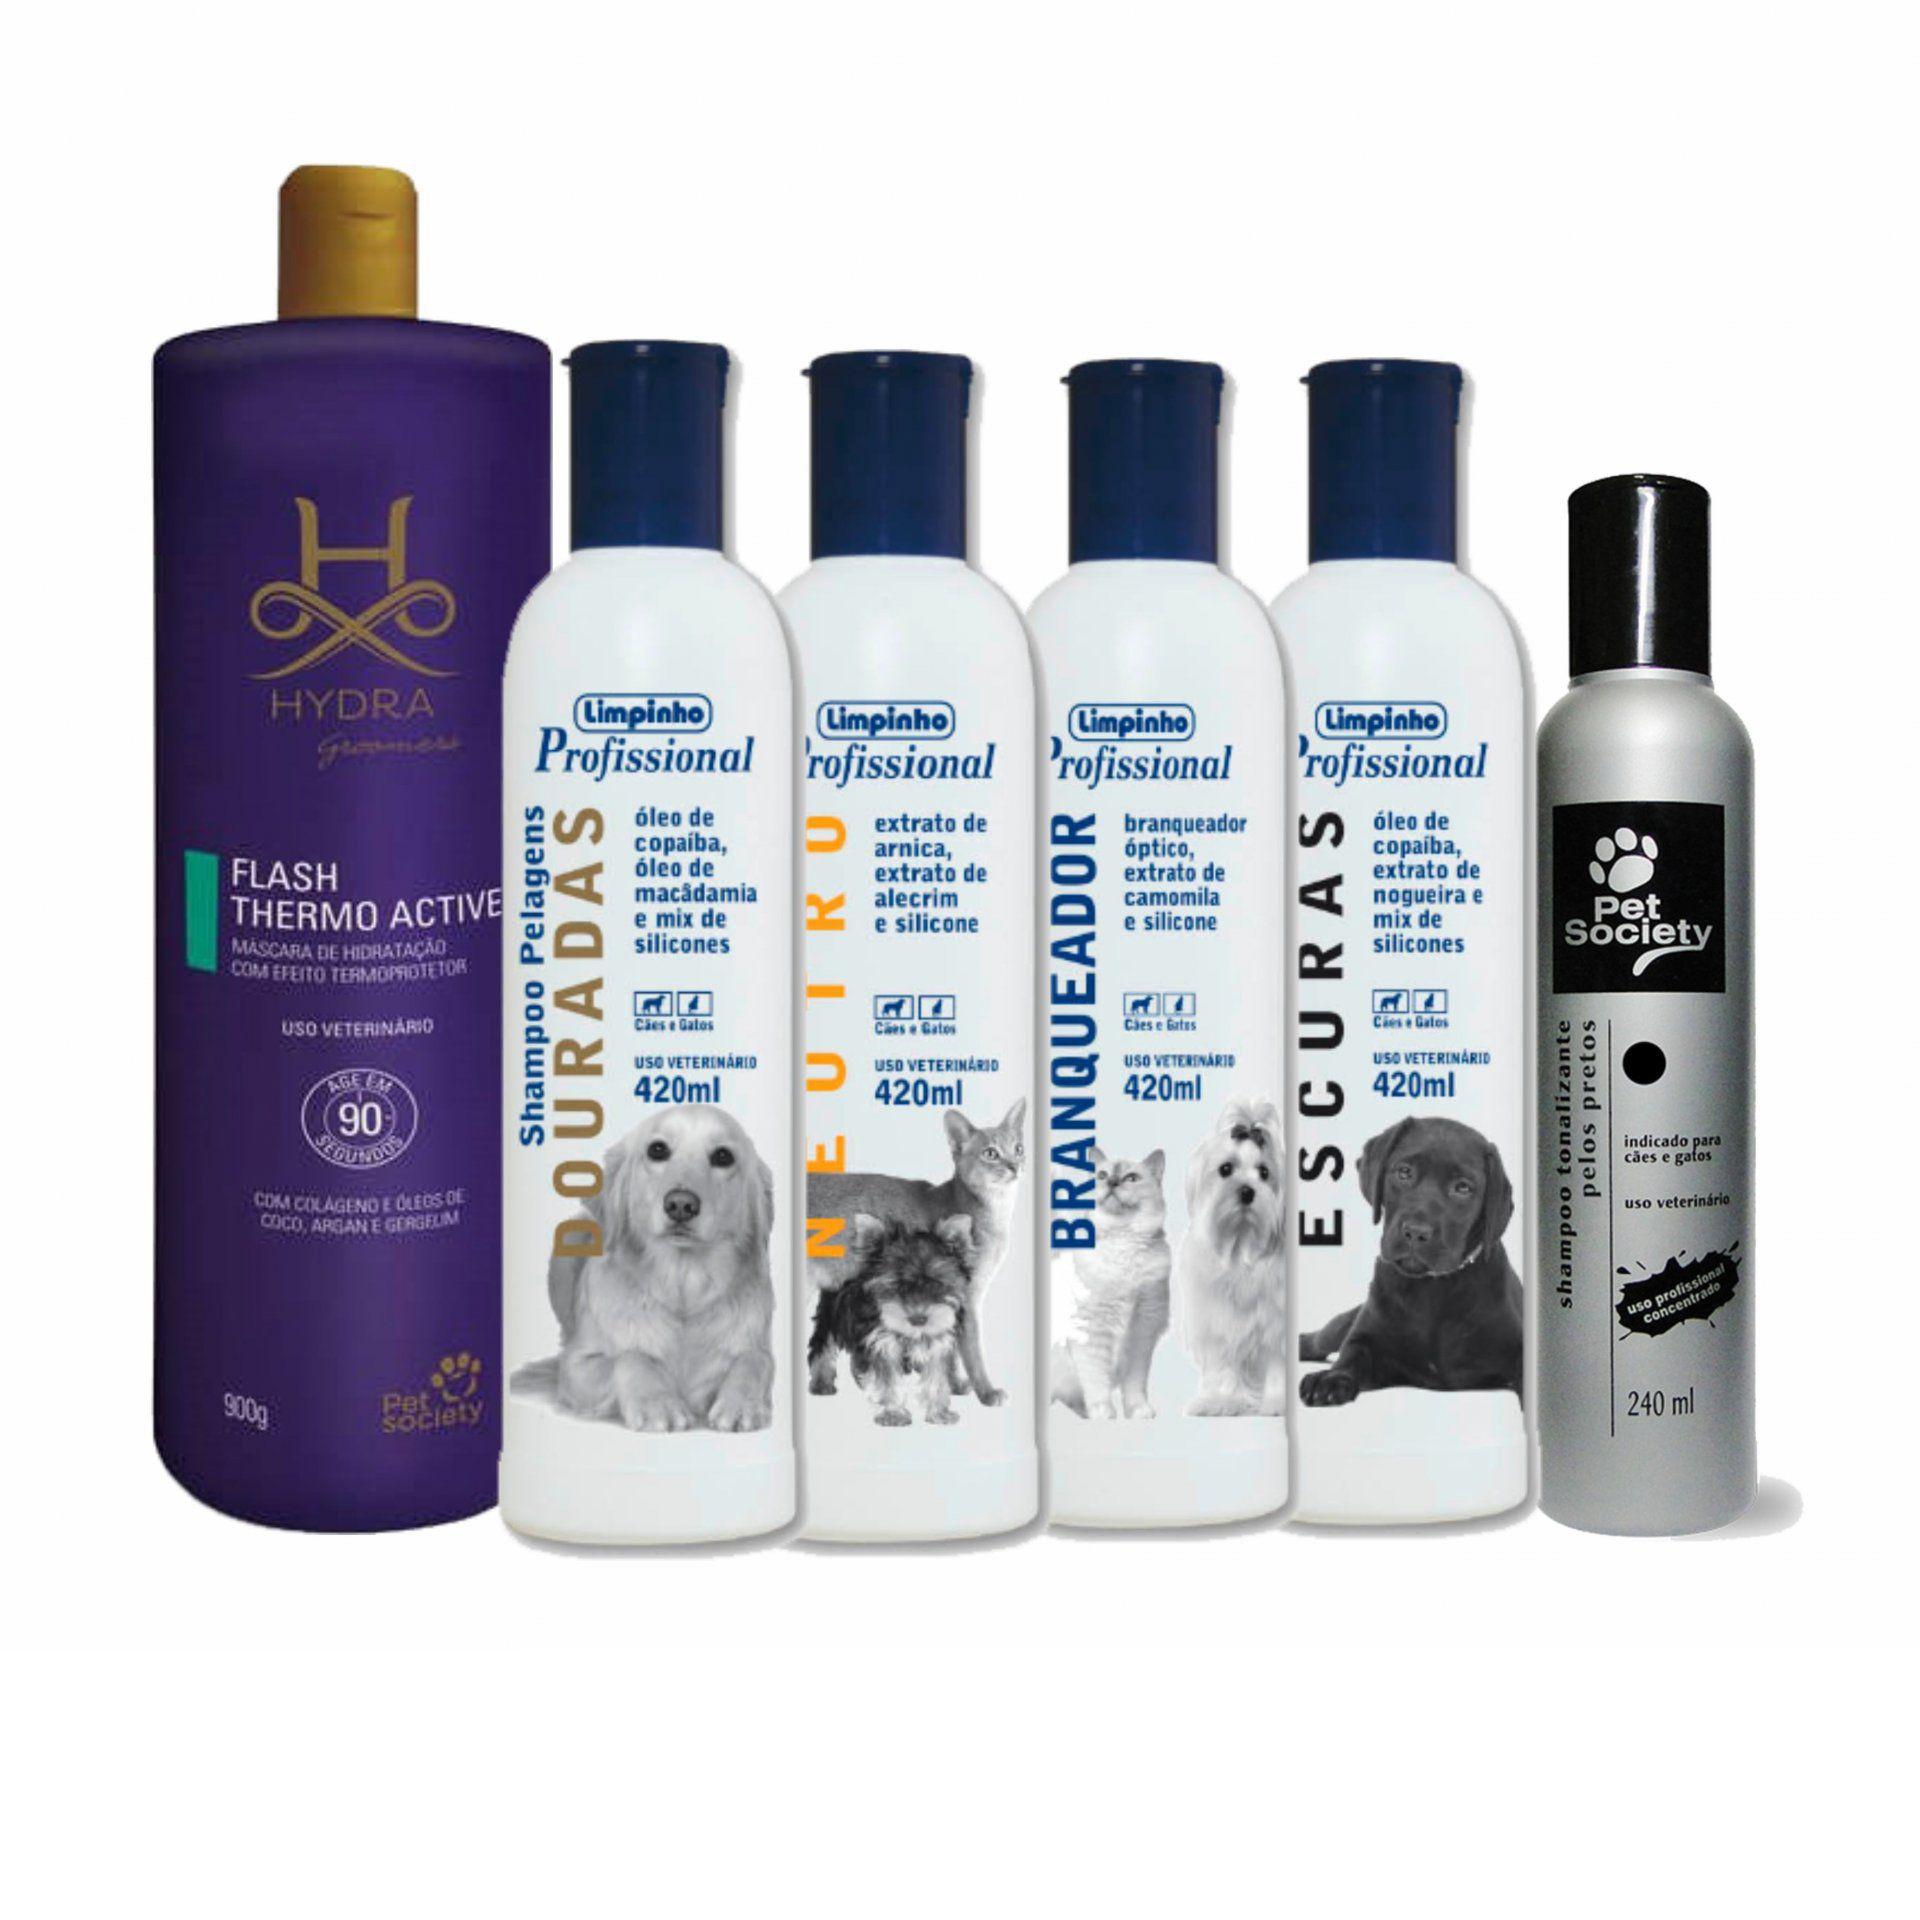 Kit Promocional Banho & Beleza I